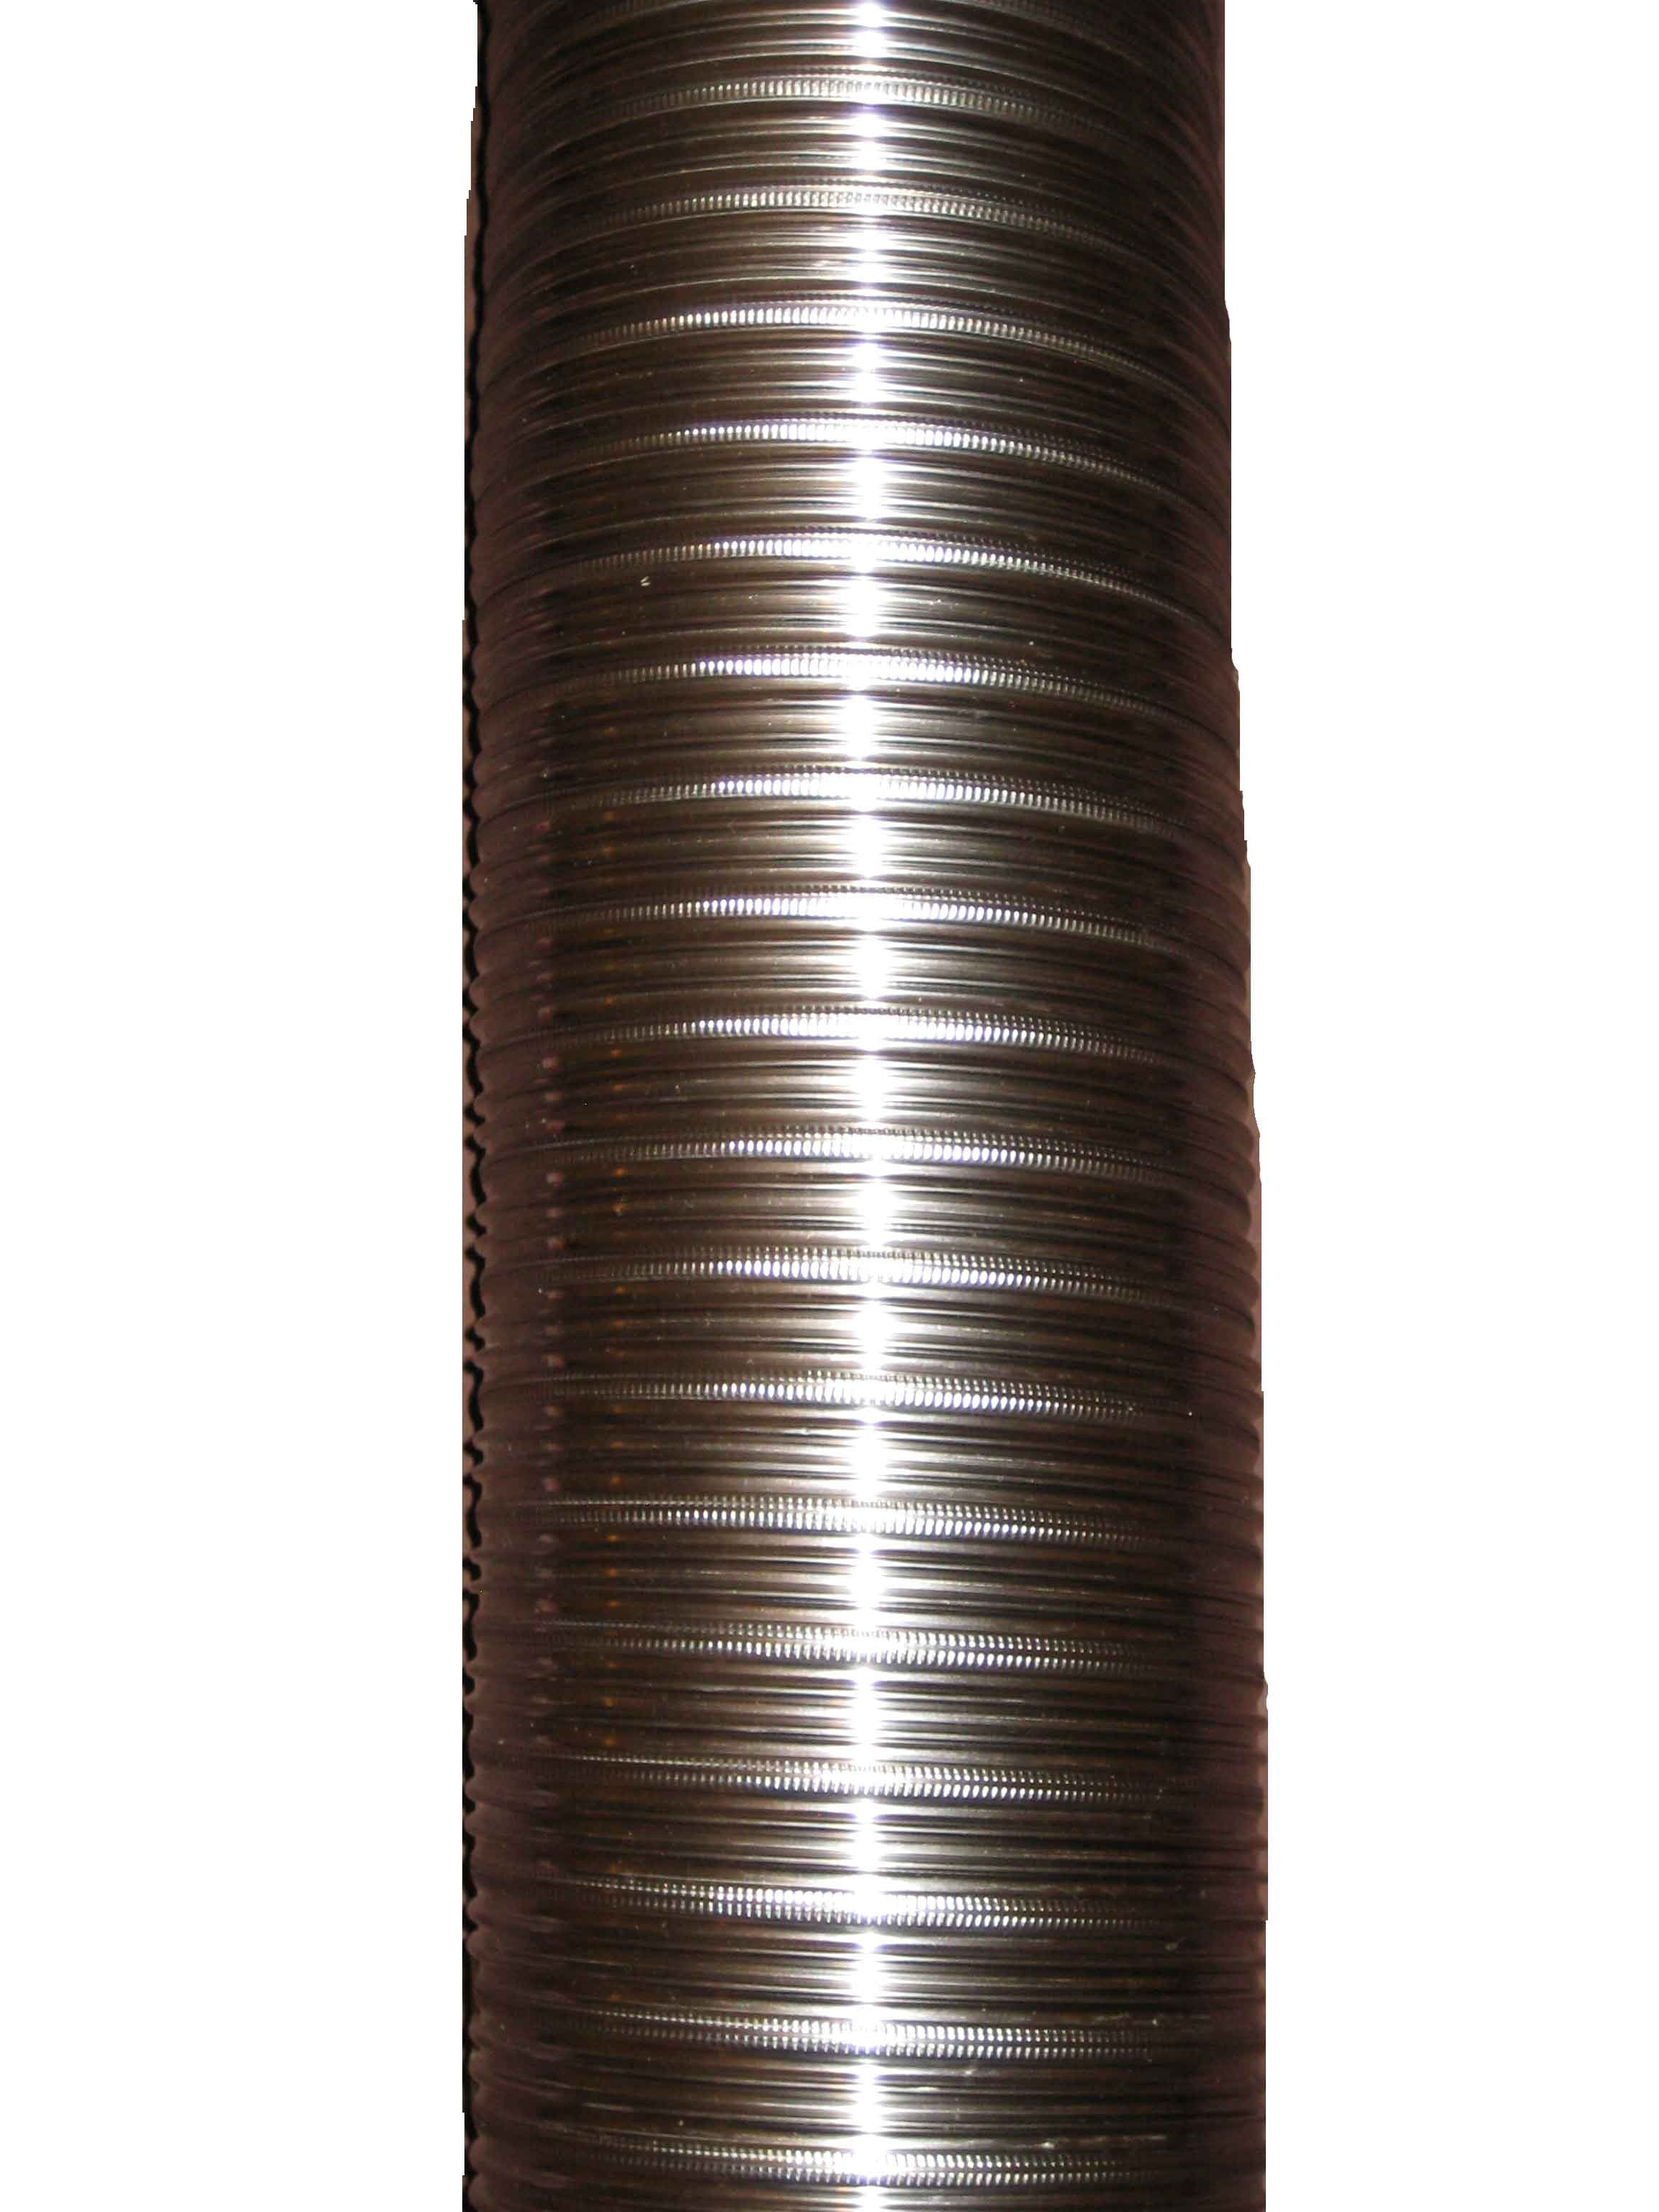 9m 150mm 316/316 Twin Wall Flexible Flue Liner